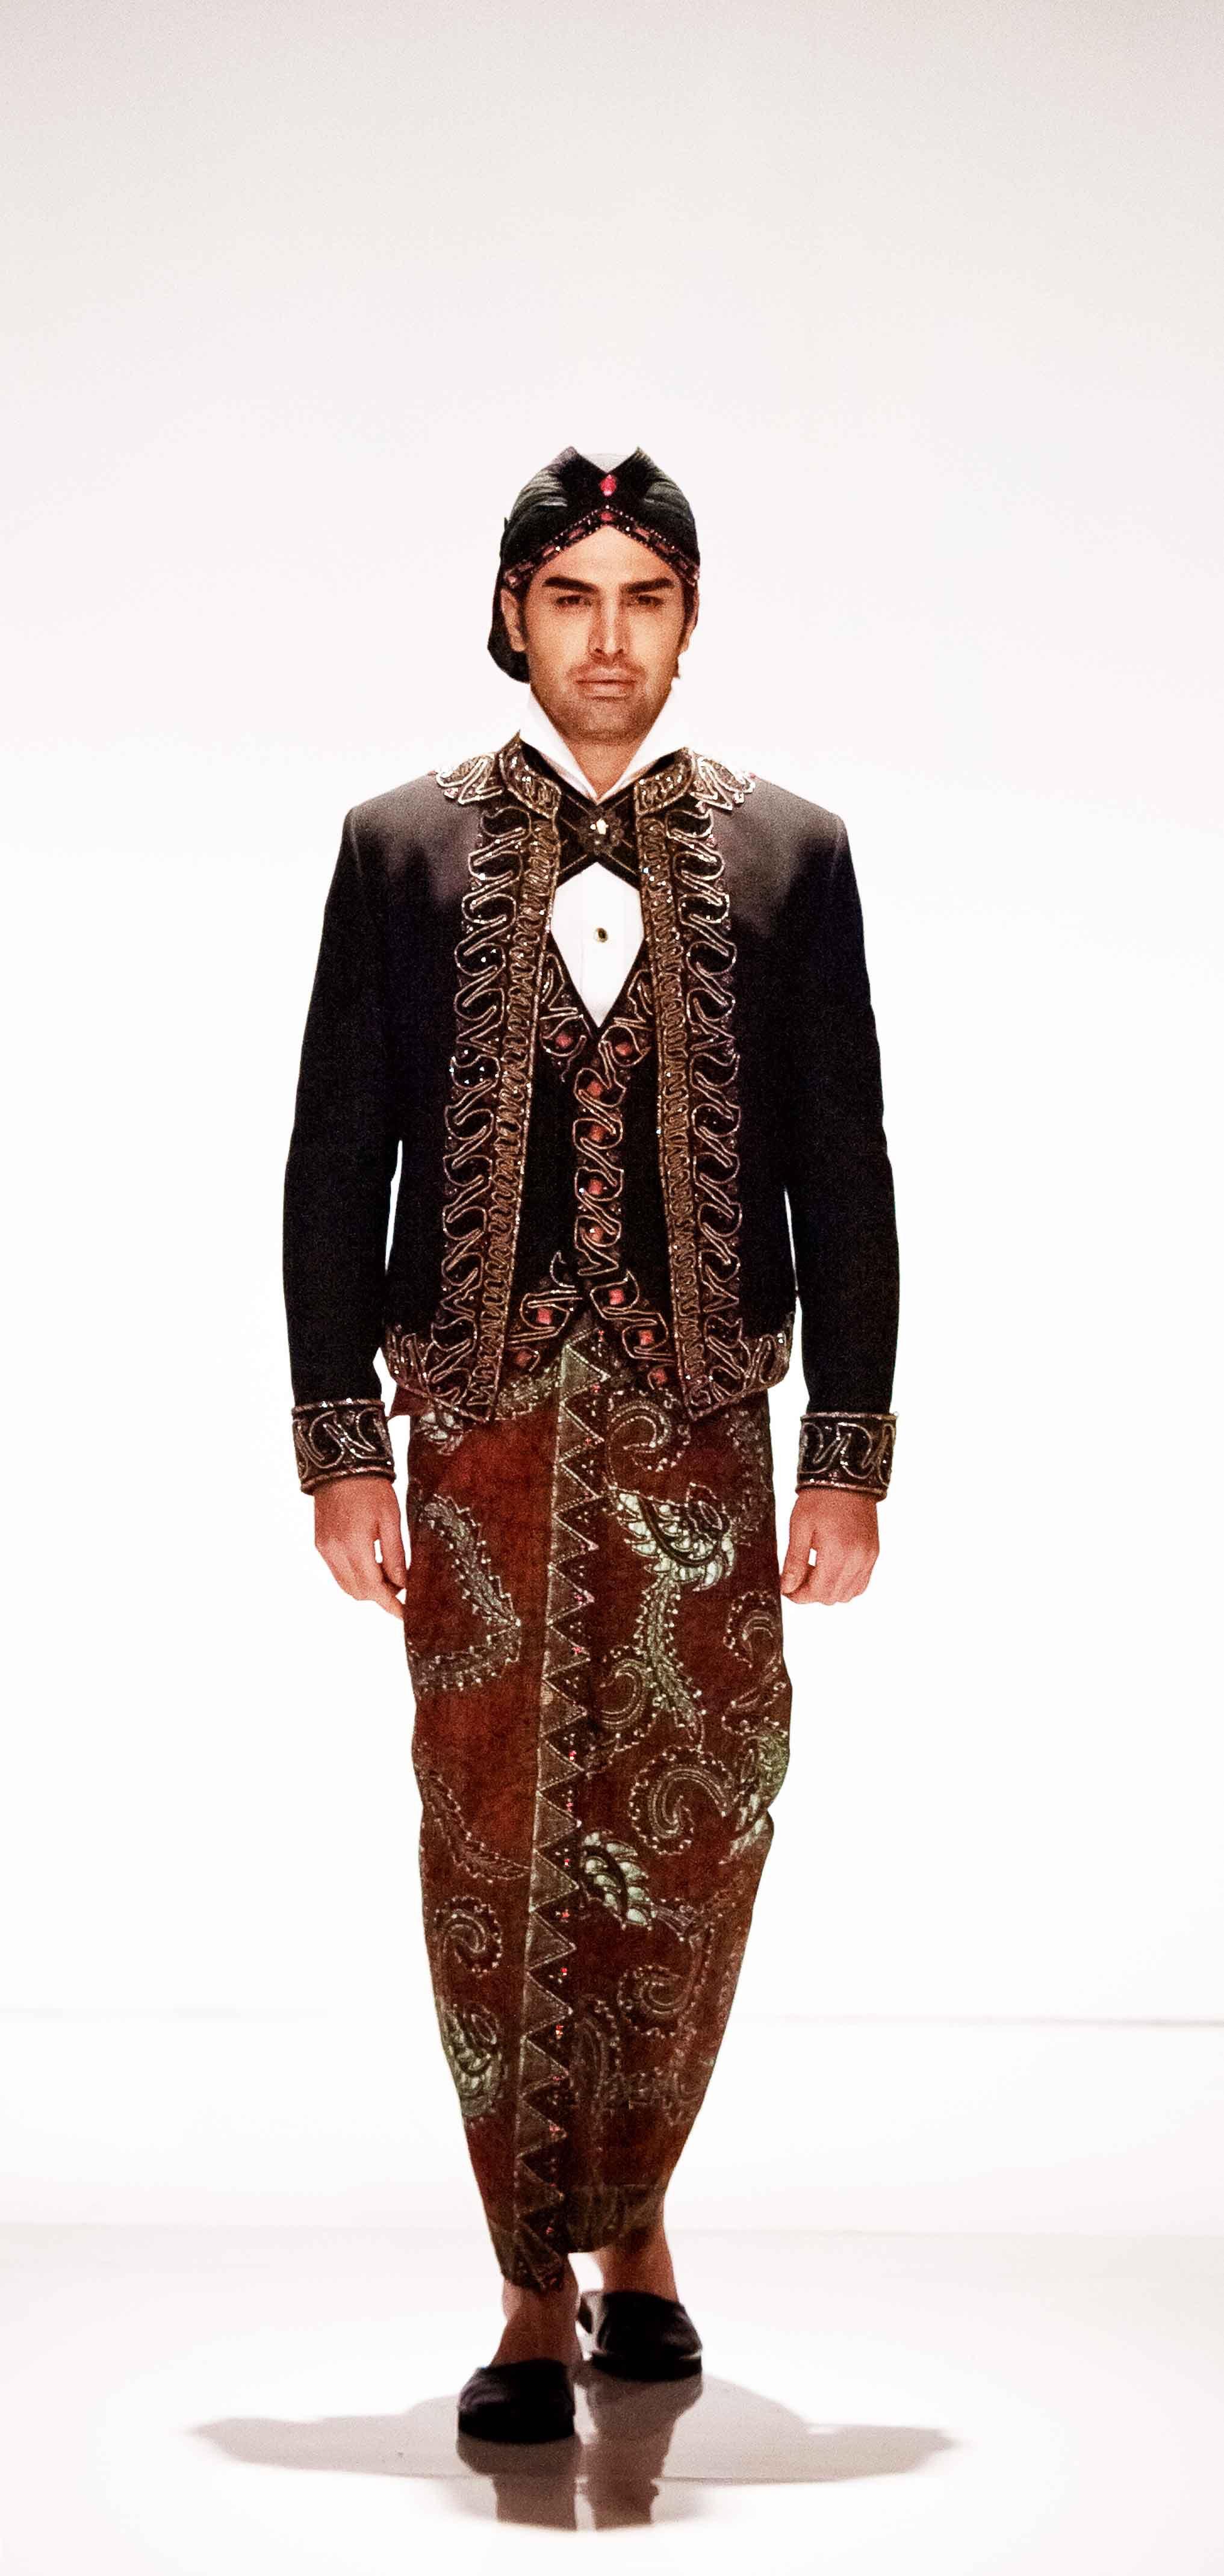 Pakaian Adat Jawa Pria